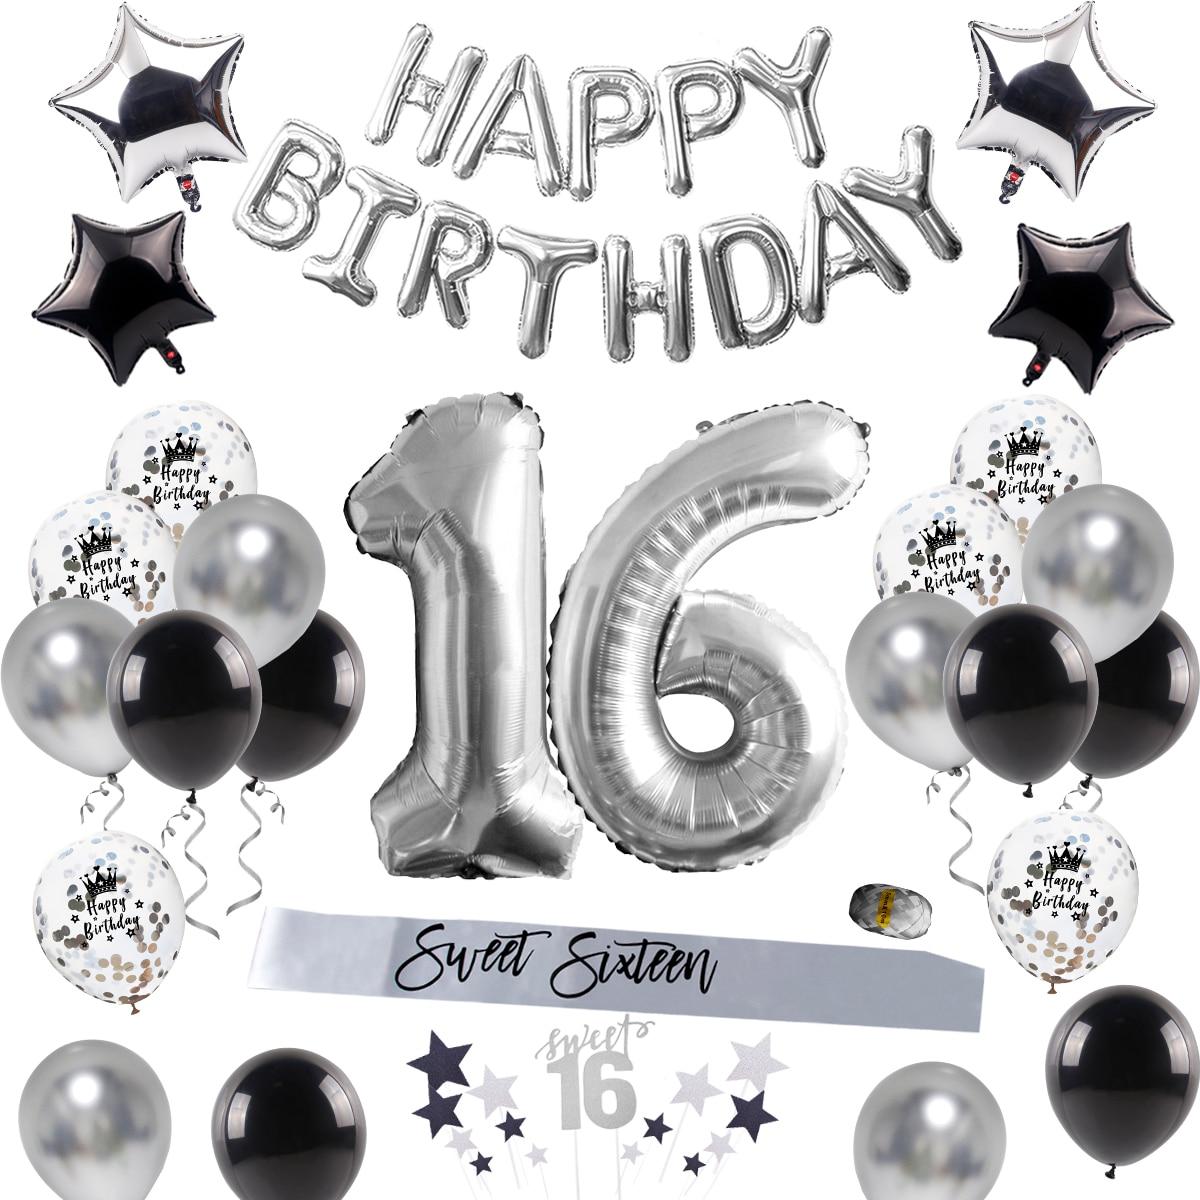 Qifu Happy Birthday Party Decorations Kids Adult 16th Birthday Balloons Sweet 16 Party Decorations 16 Birthday Decor Rose Gold Party Diy Decorations Aliexpress